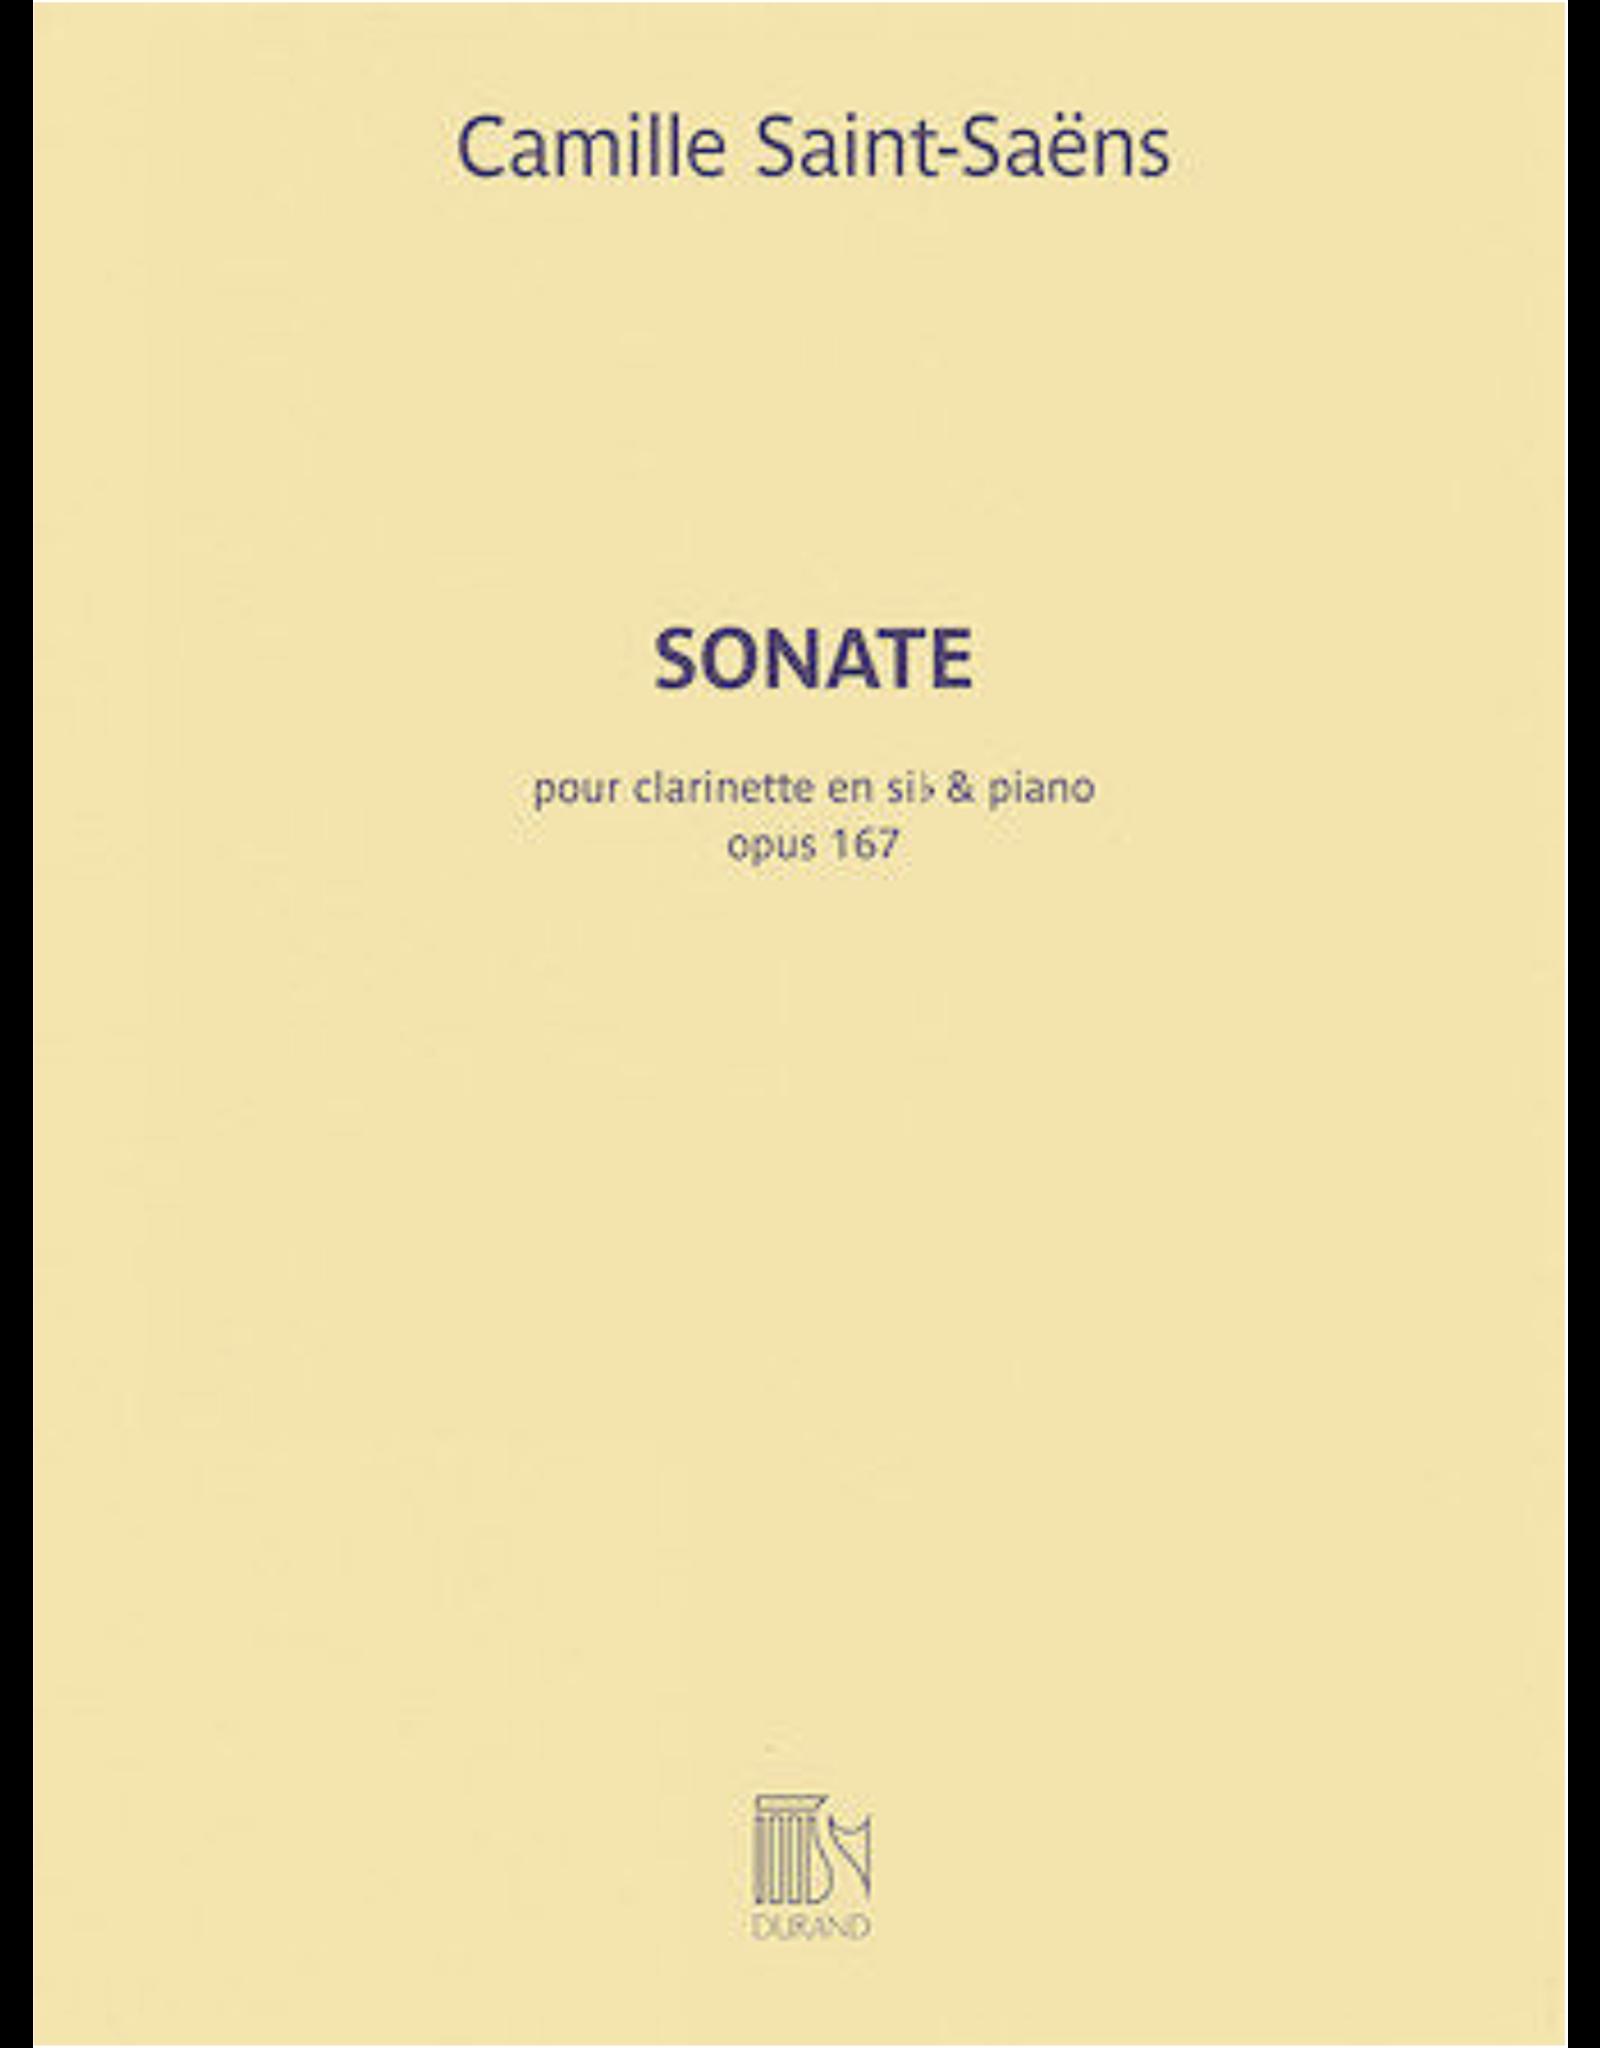 Hal Leonard Saint-Saens - Sonata, Op. 167 Clarinet in E-flat and Piano Editions Durand